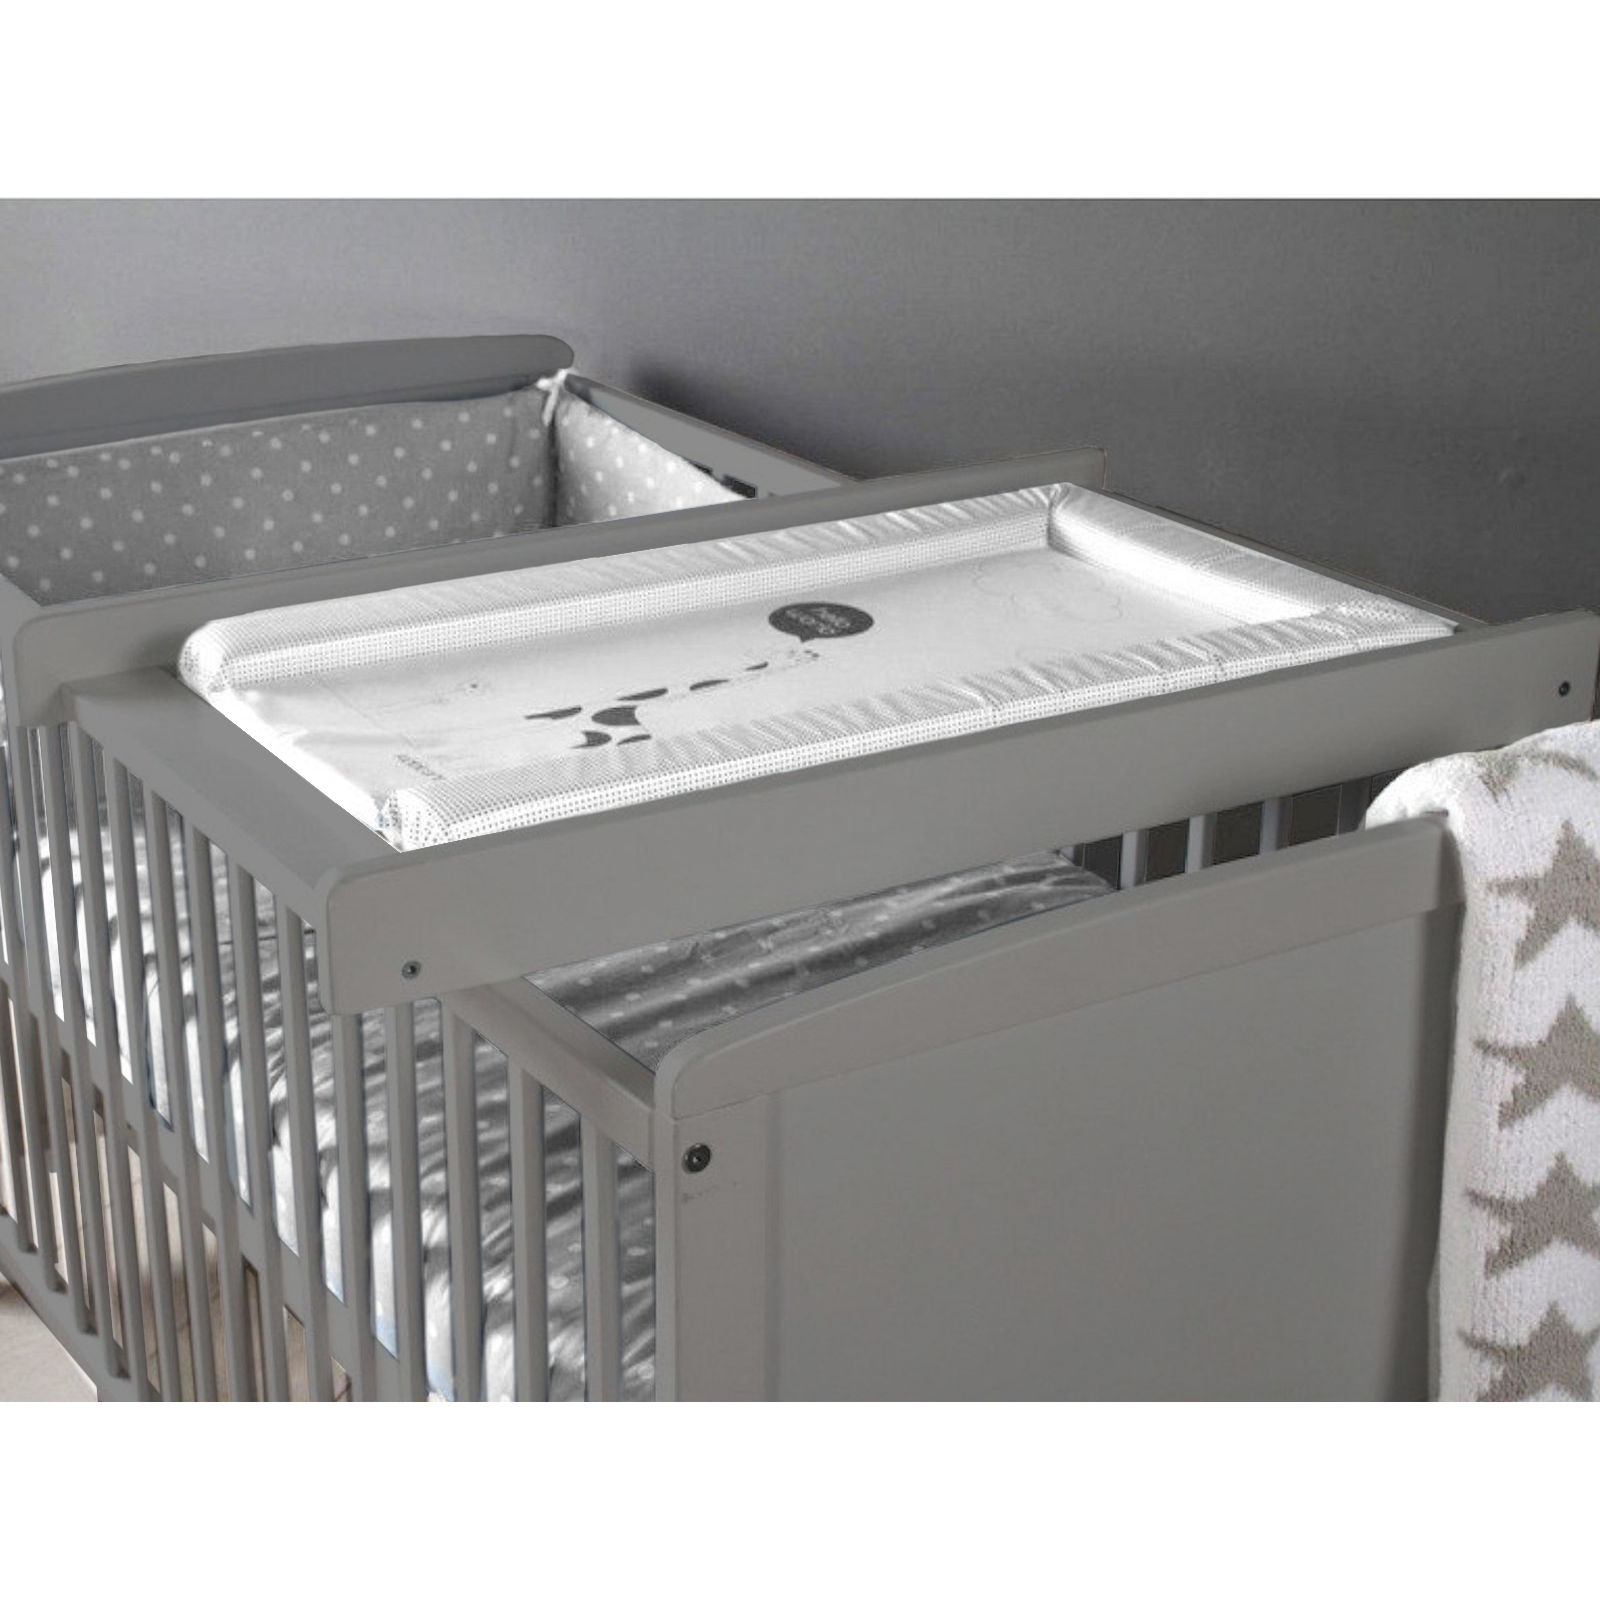 little acorns cot top changer grey buy at online4baby. Black Bedroom Furniture Sets. Home Design Ideas